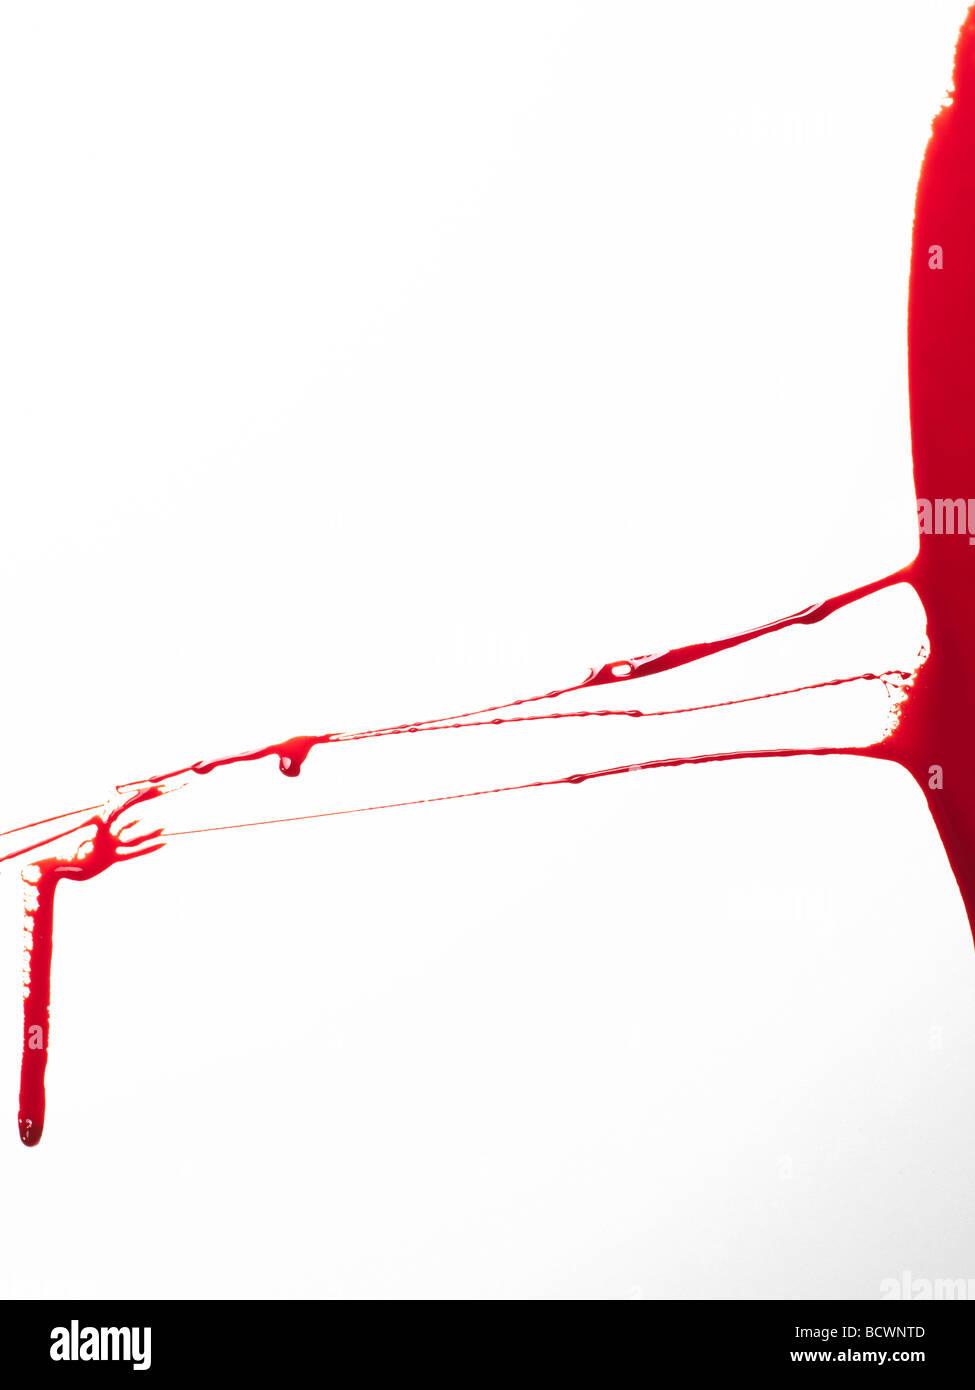 sangue 6 Immagini Stock